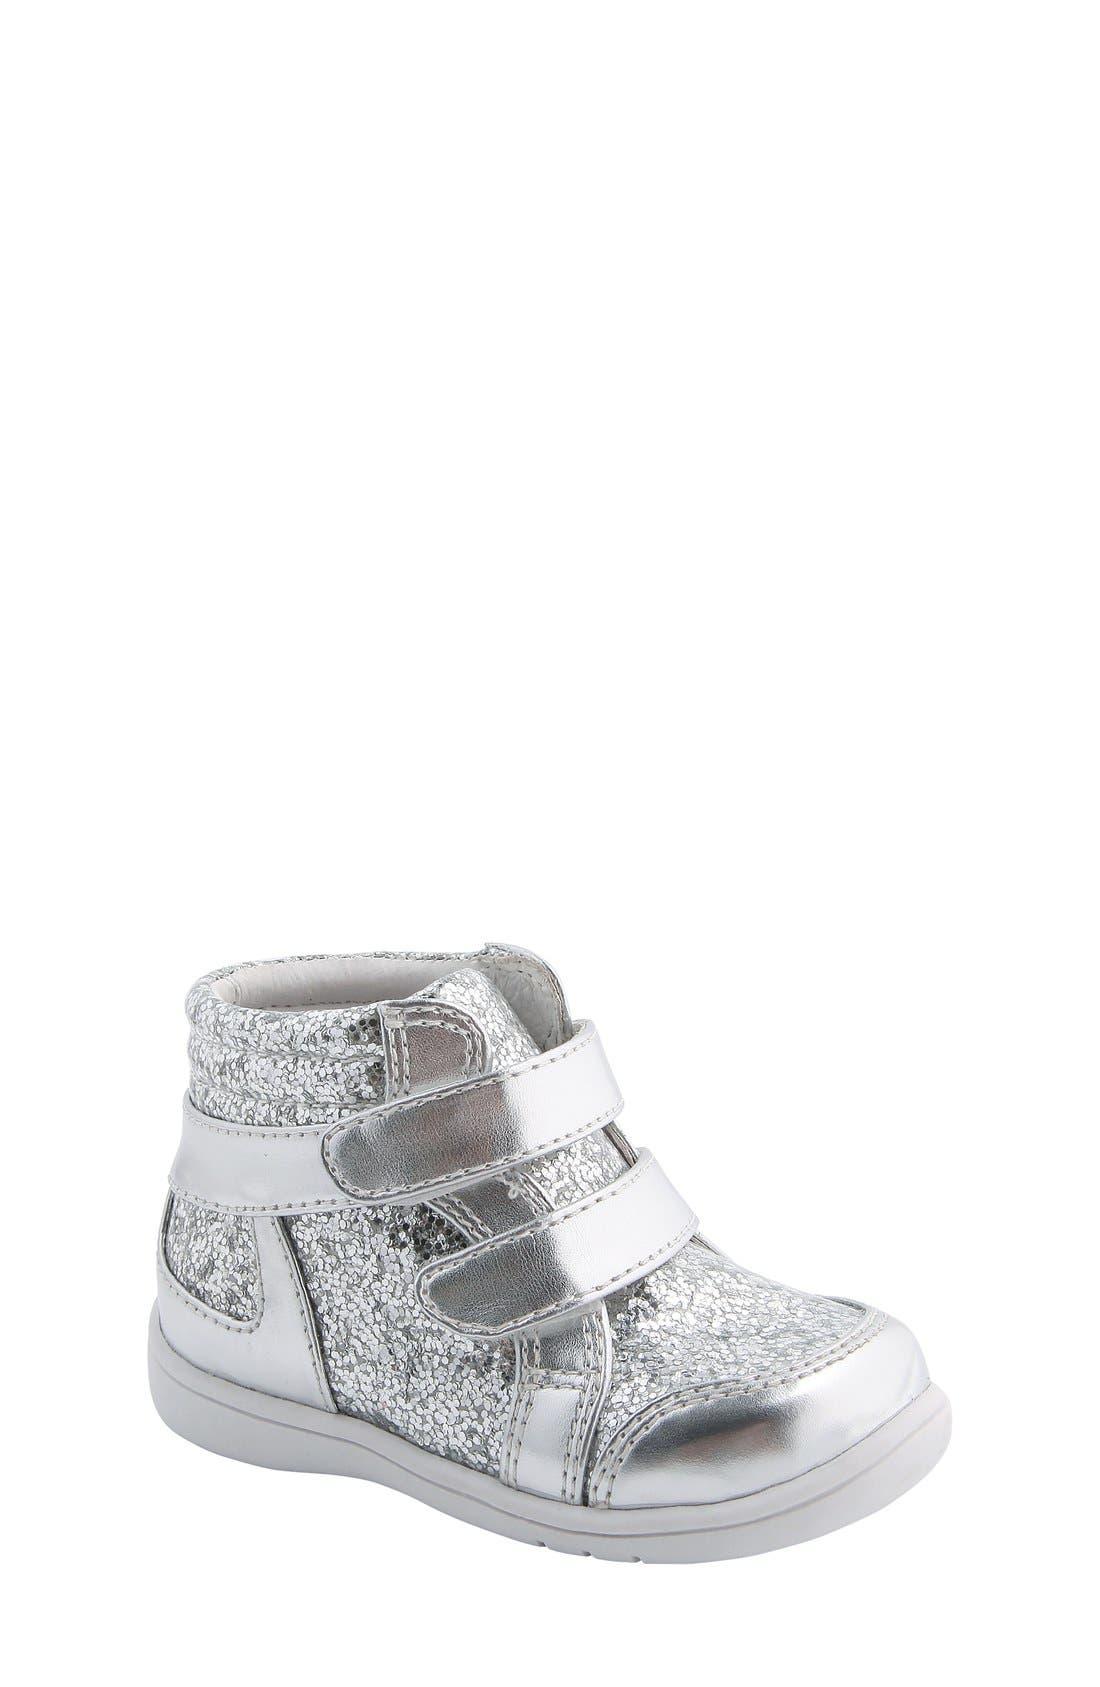 Nina 'Stardust' Metallic High Top Sneaker,                             Main thumbnail 1, color,                             047